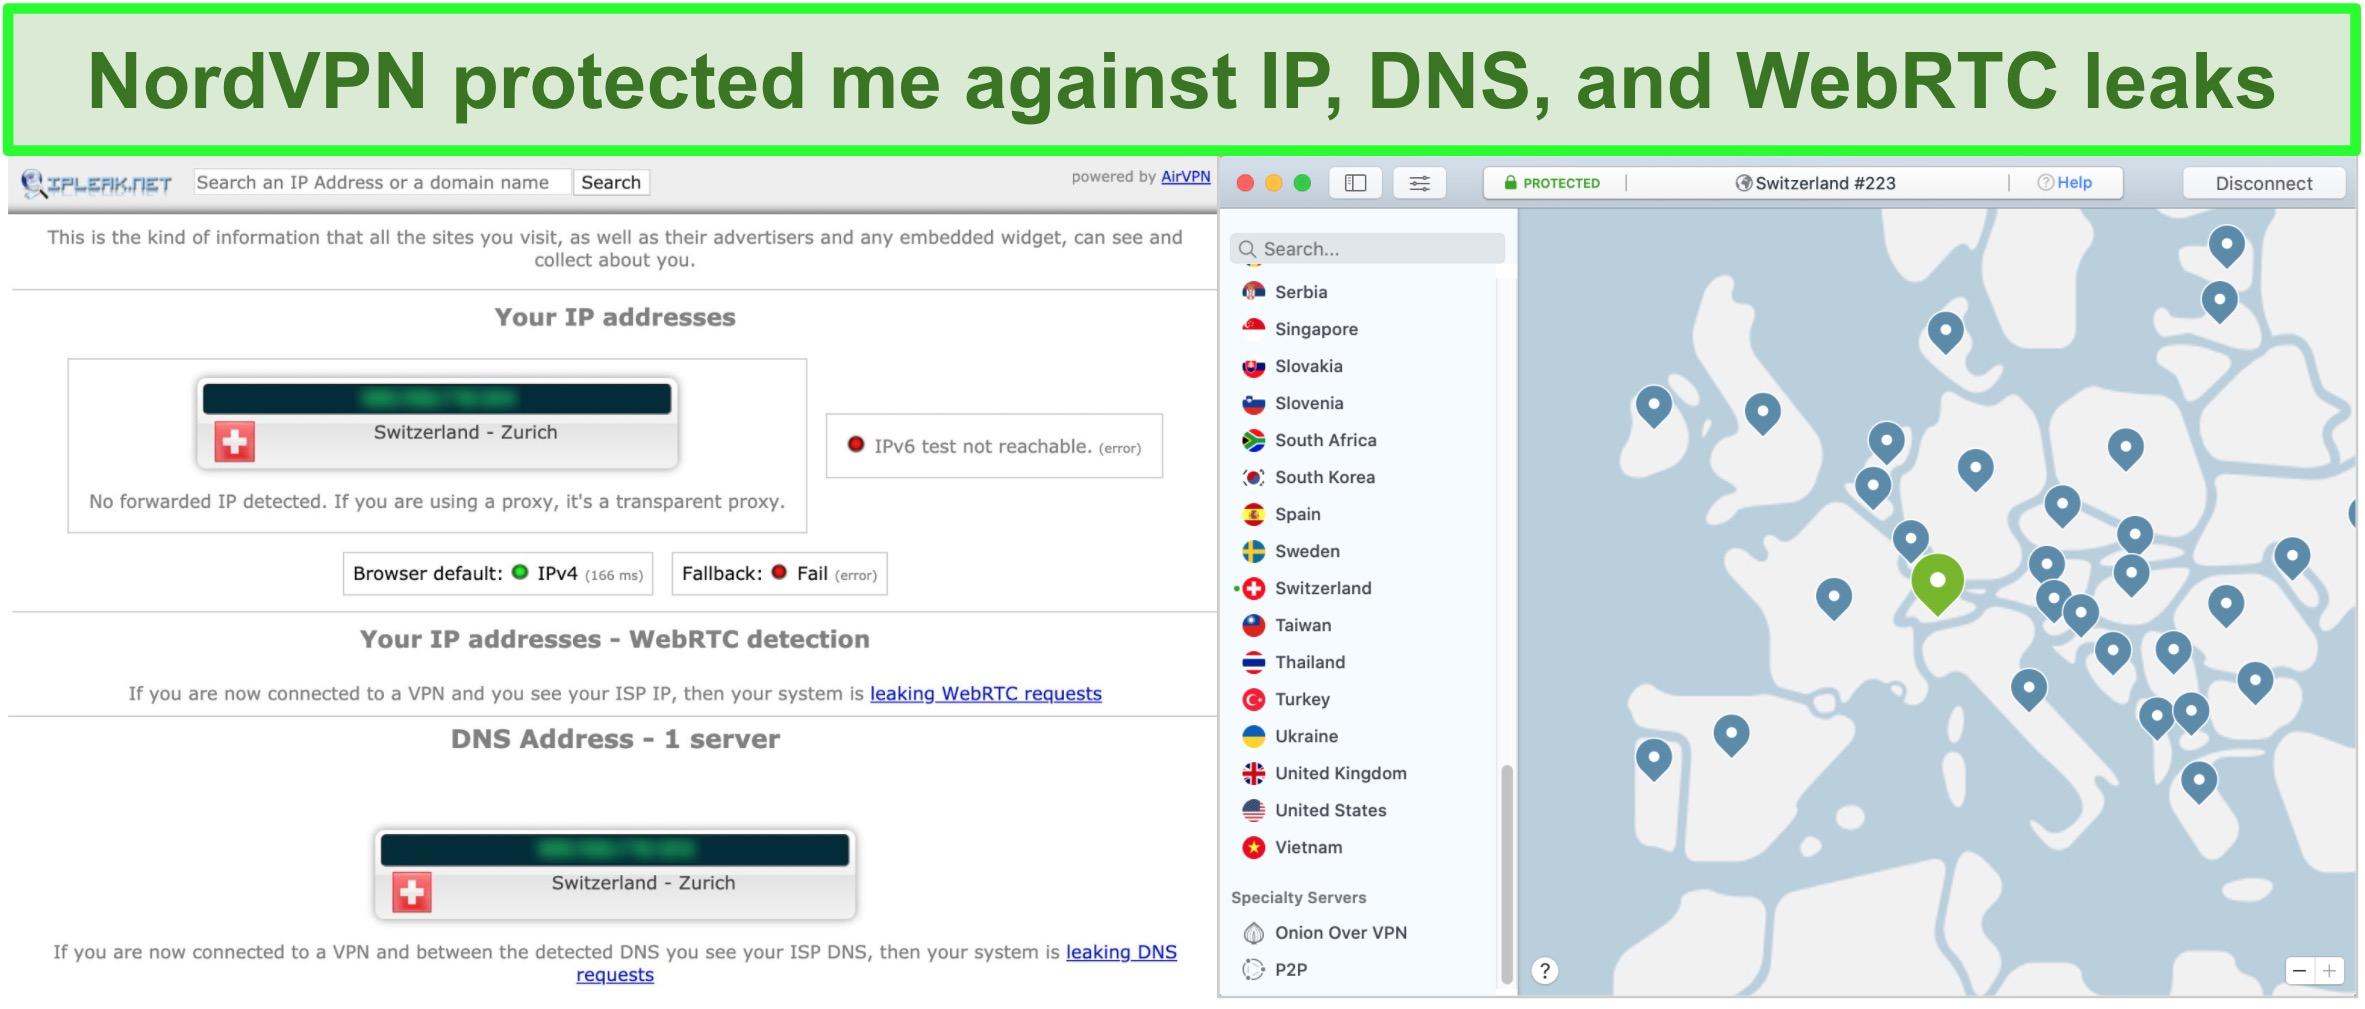 Screenshot showing NordVPN passed IP, DNS, and WebRTC leaks